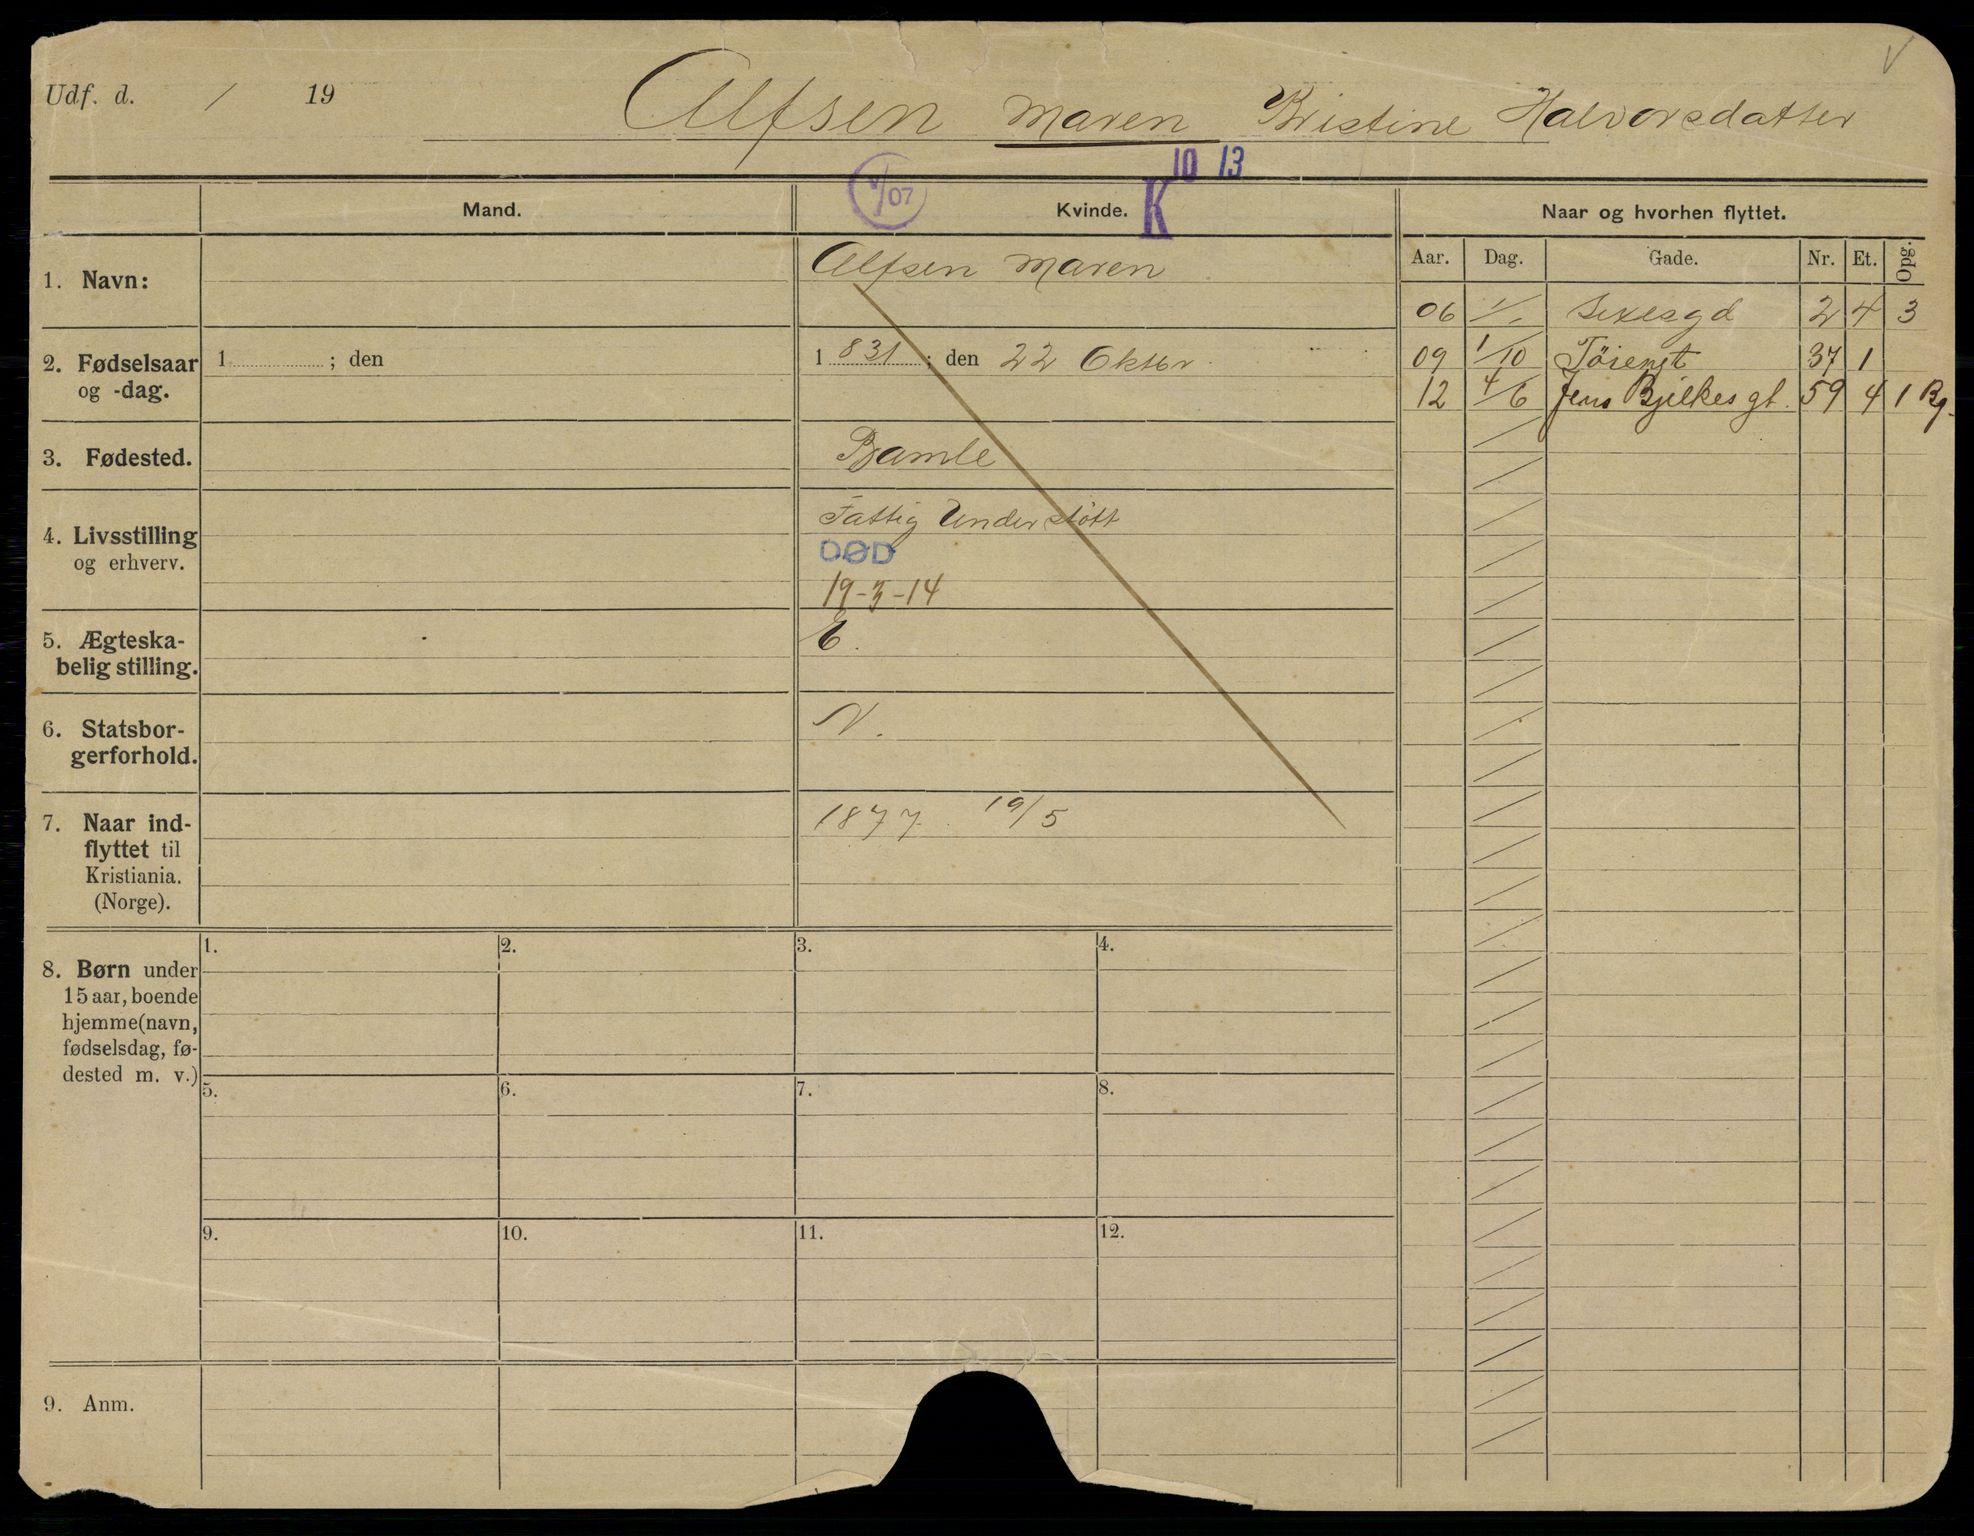 SAO, Oslo folkeregister, Registerkort, G/Gb/L0018: Kvinner, 1914